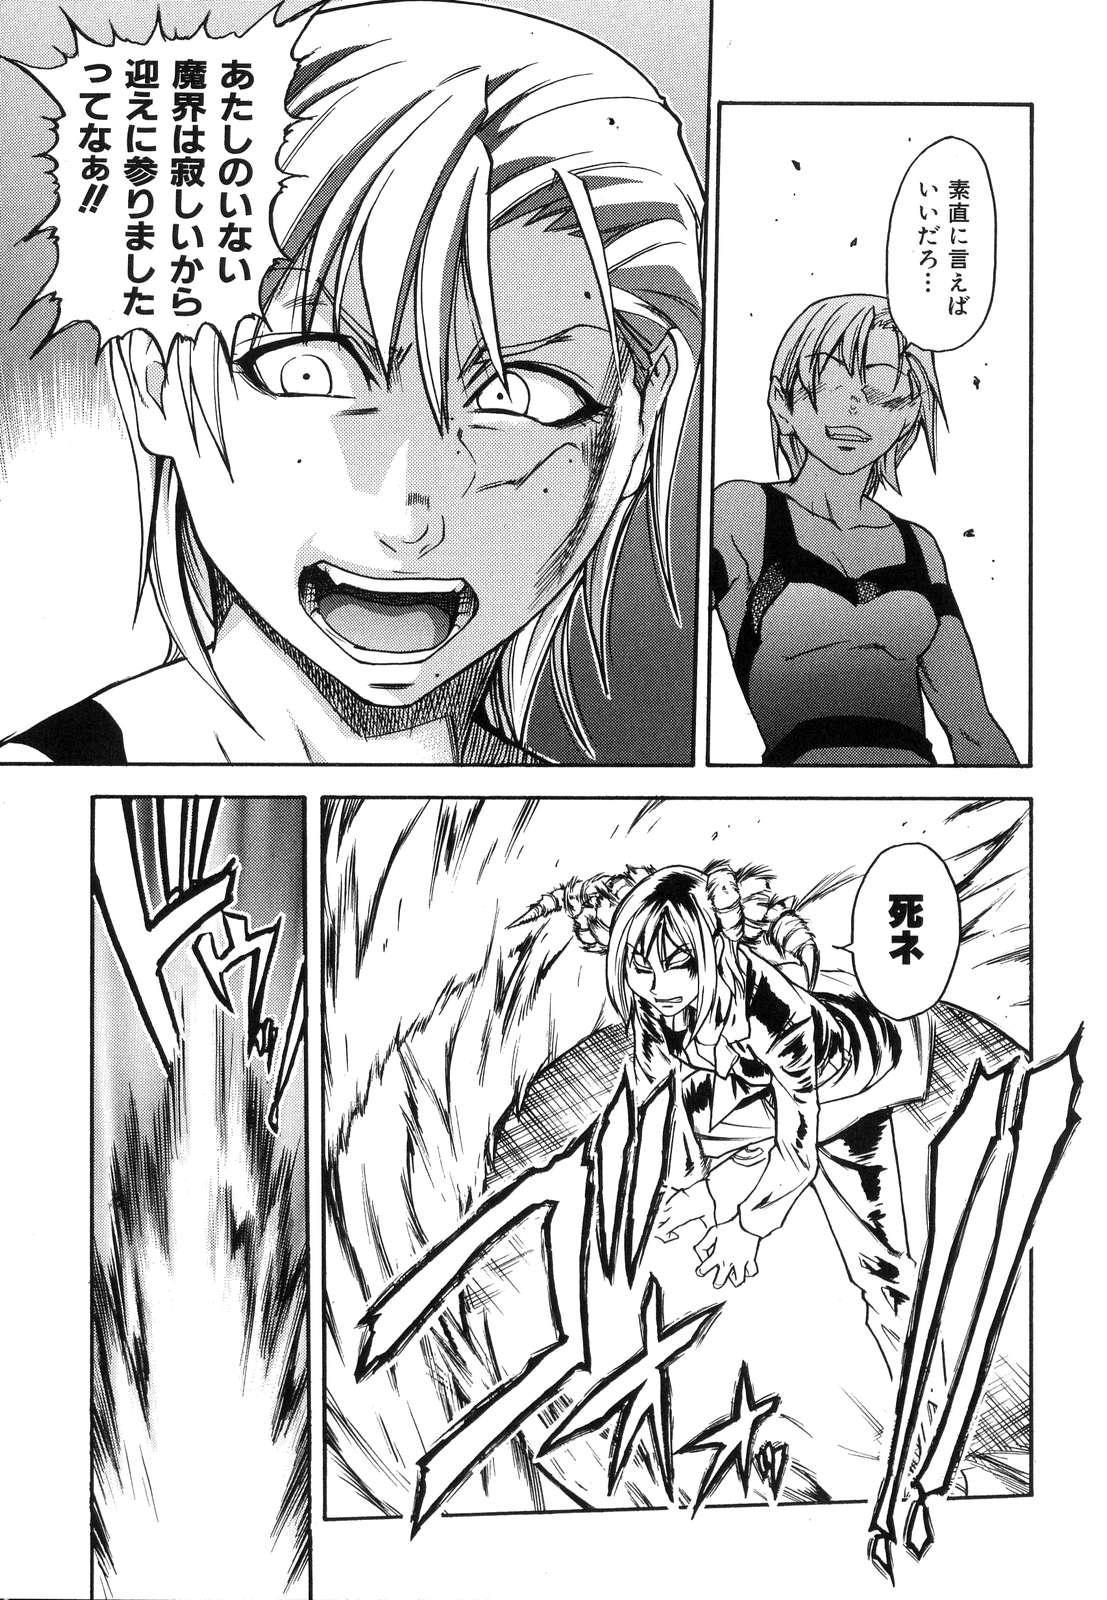 Shining Musume. 6. Rainbow Six 110